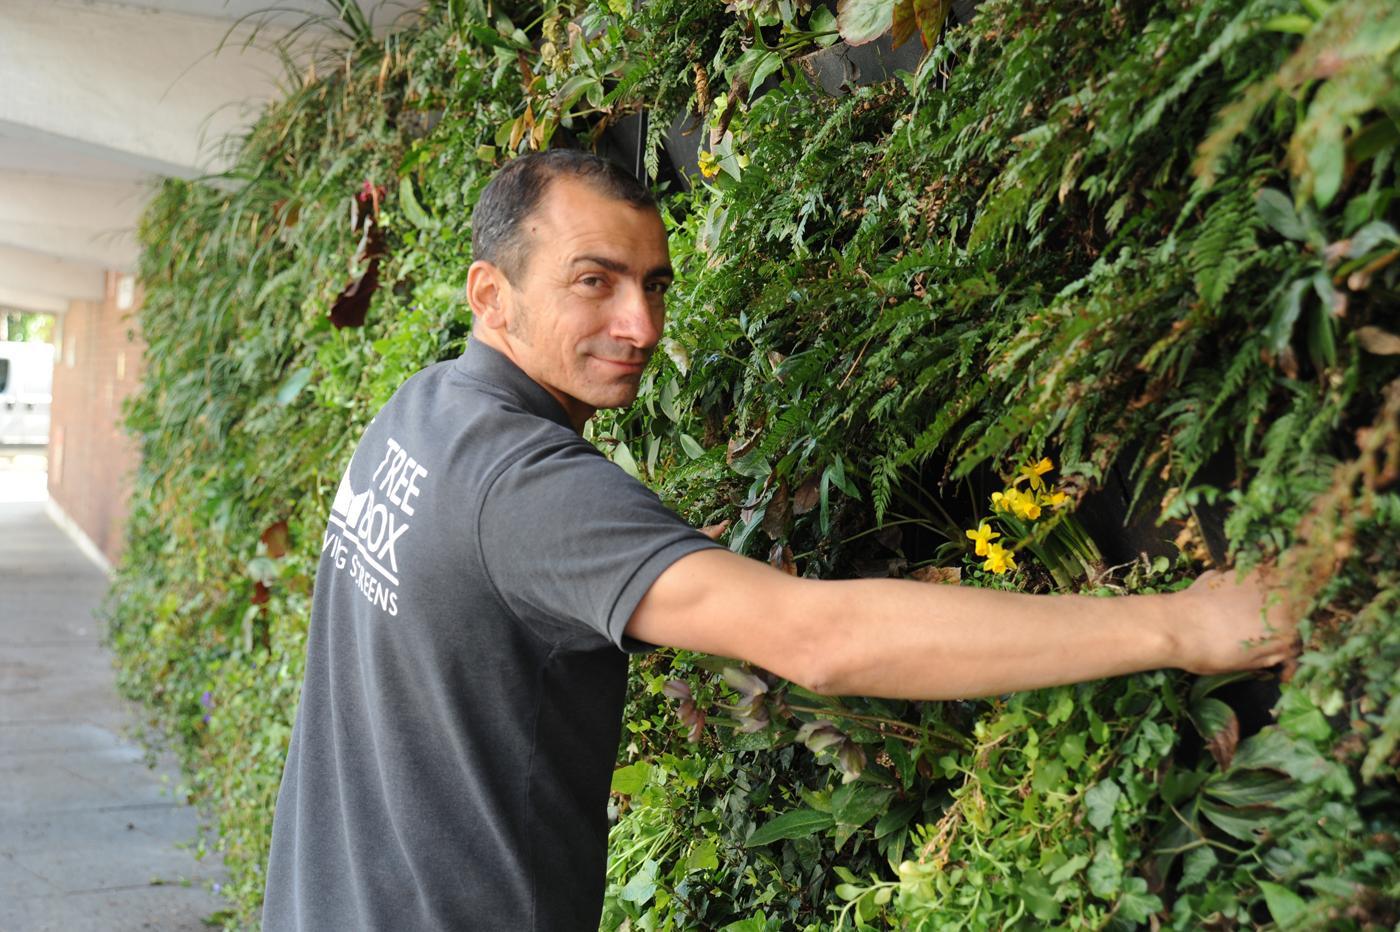 The Rain Garden was installed by urban greening firm Treebox